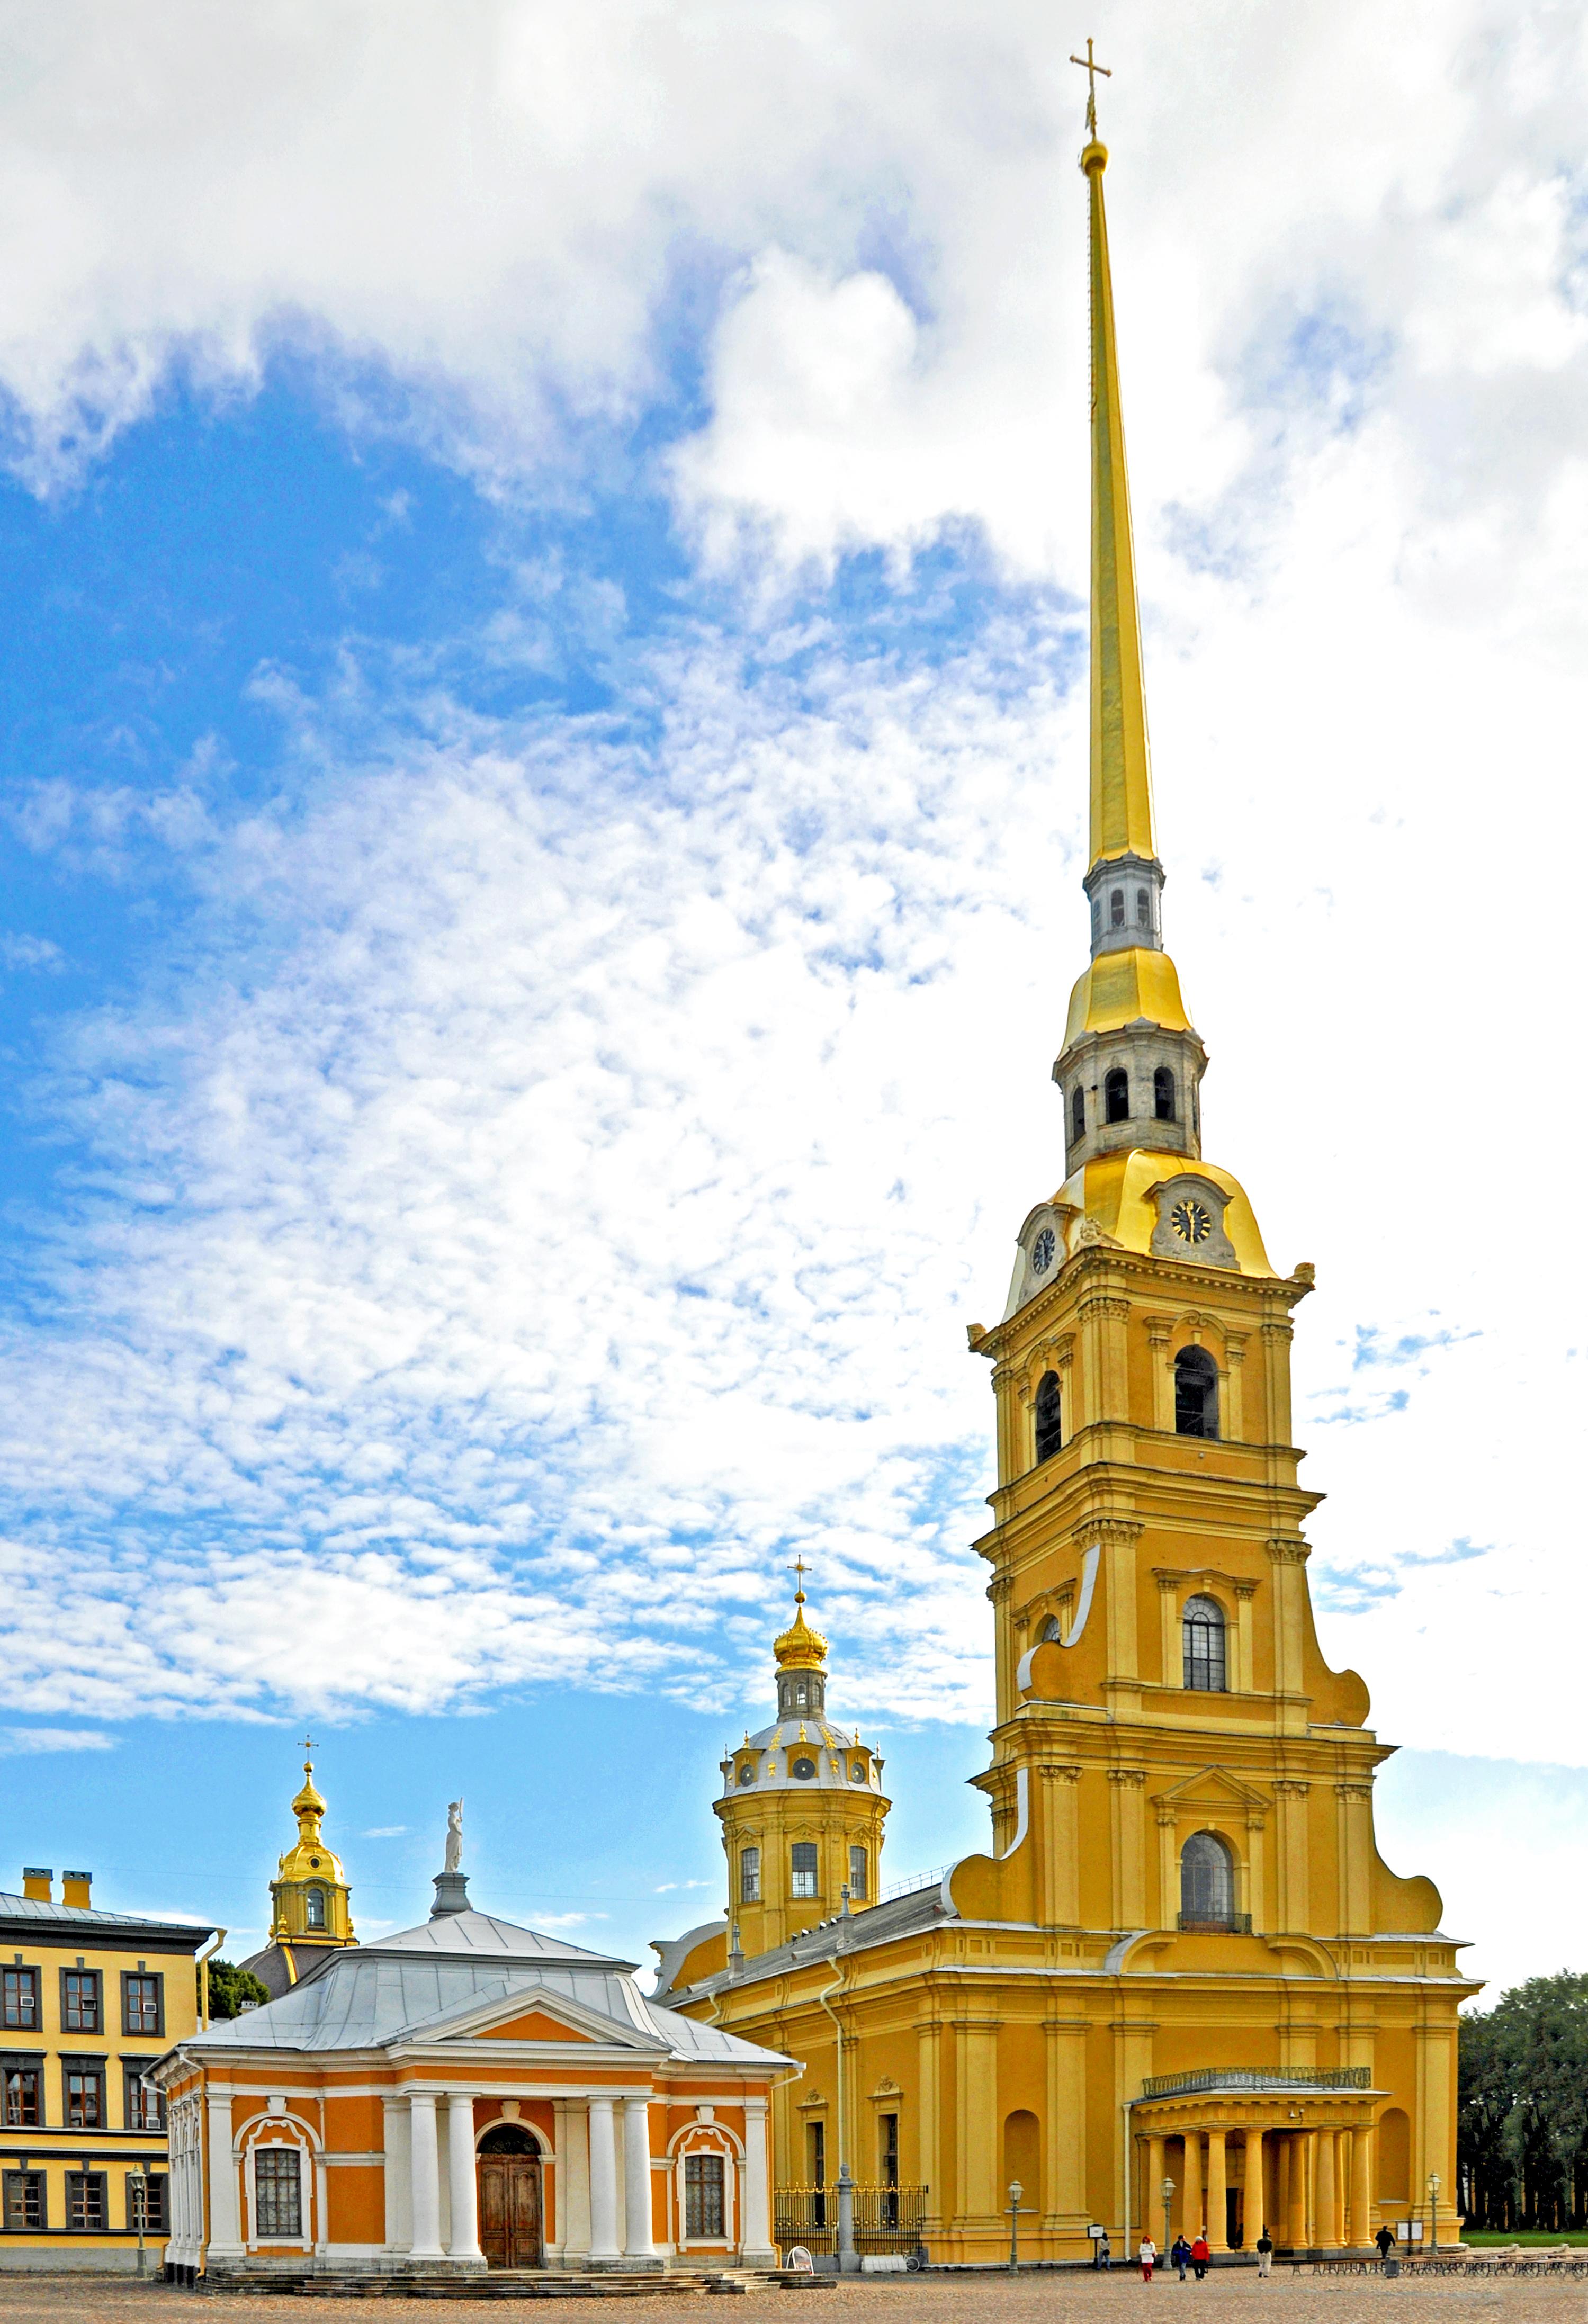 St Petersburg Nood: Peter And Paul Fortress, Saint Petersburg, Russia